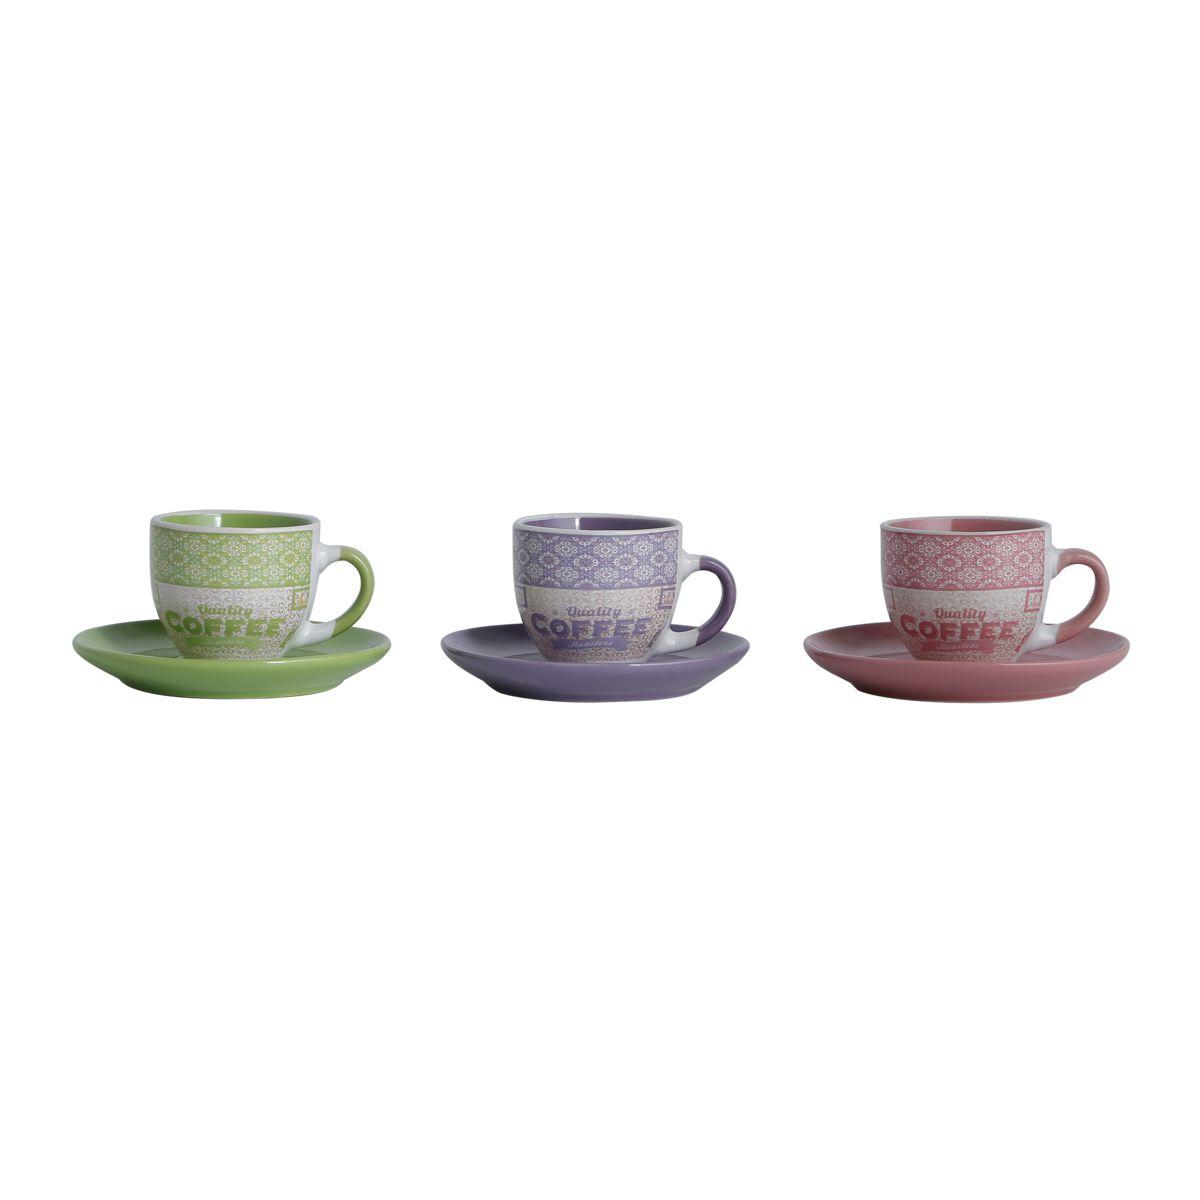 Conjunto de Xícaras de Café Bon Gourmet Colors 90ml 25435 - 12 Peças